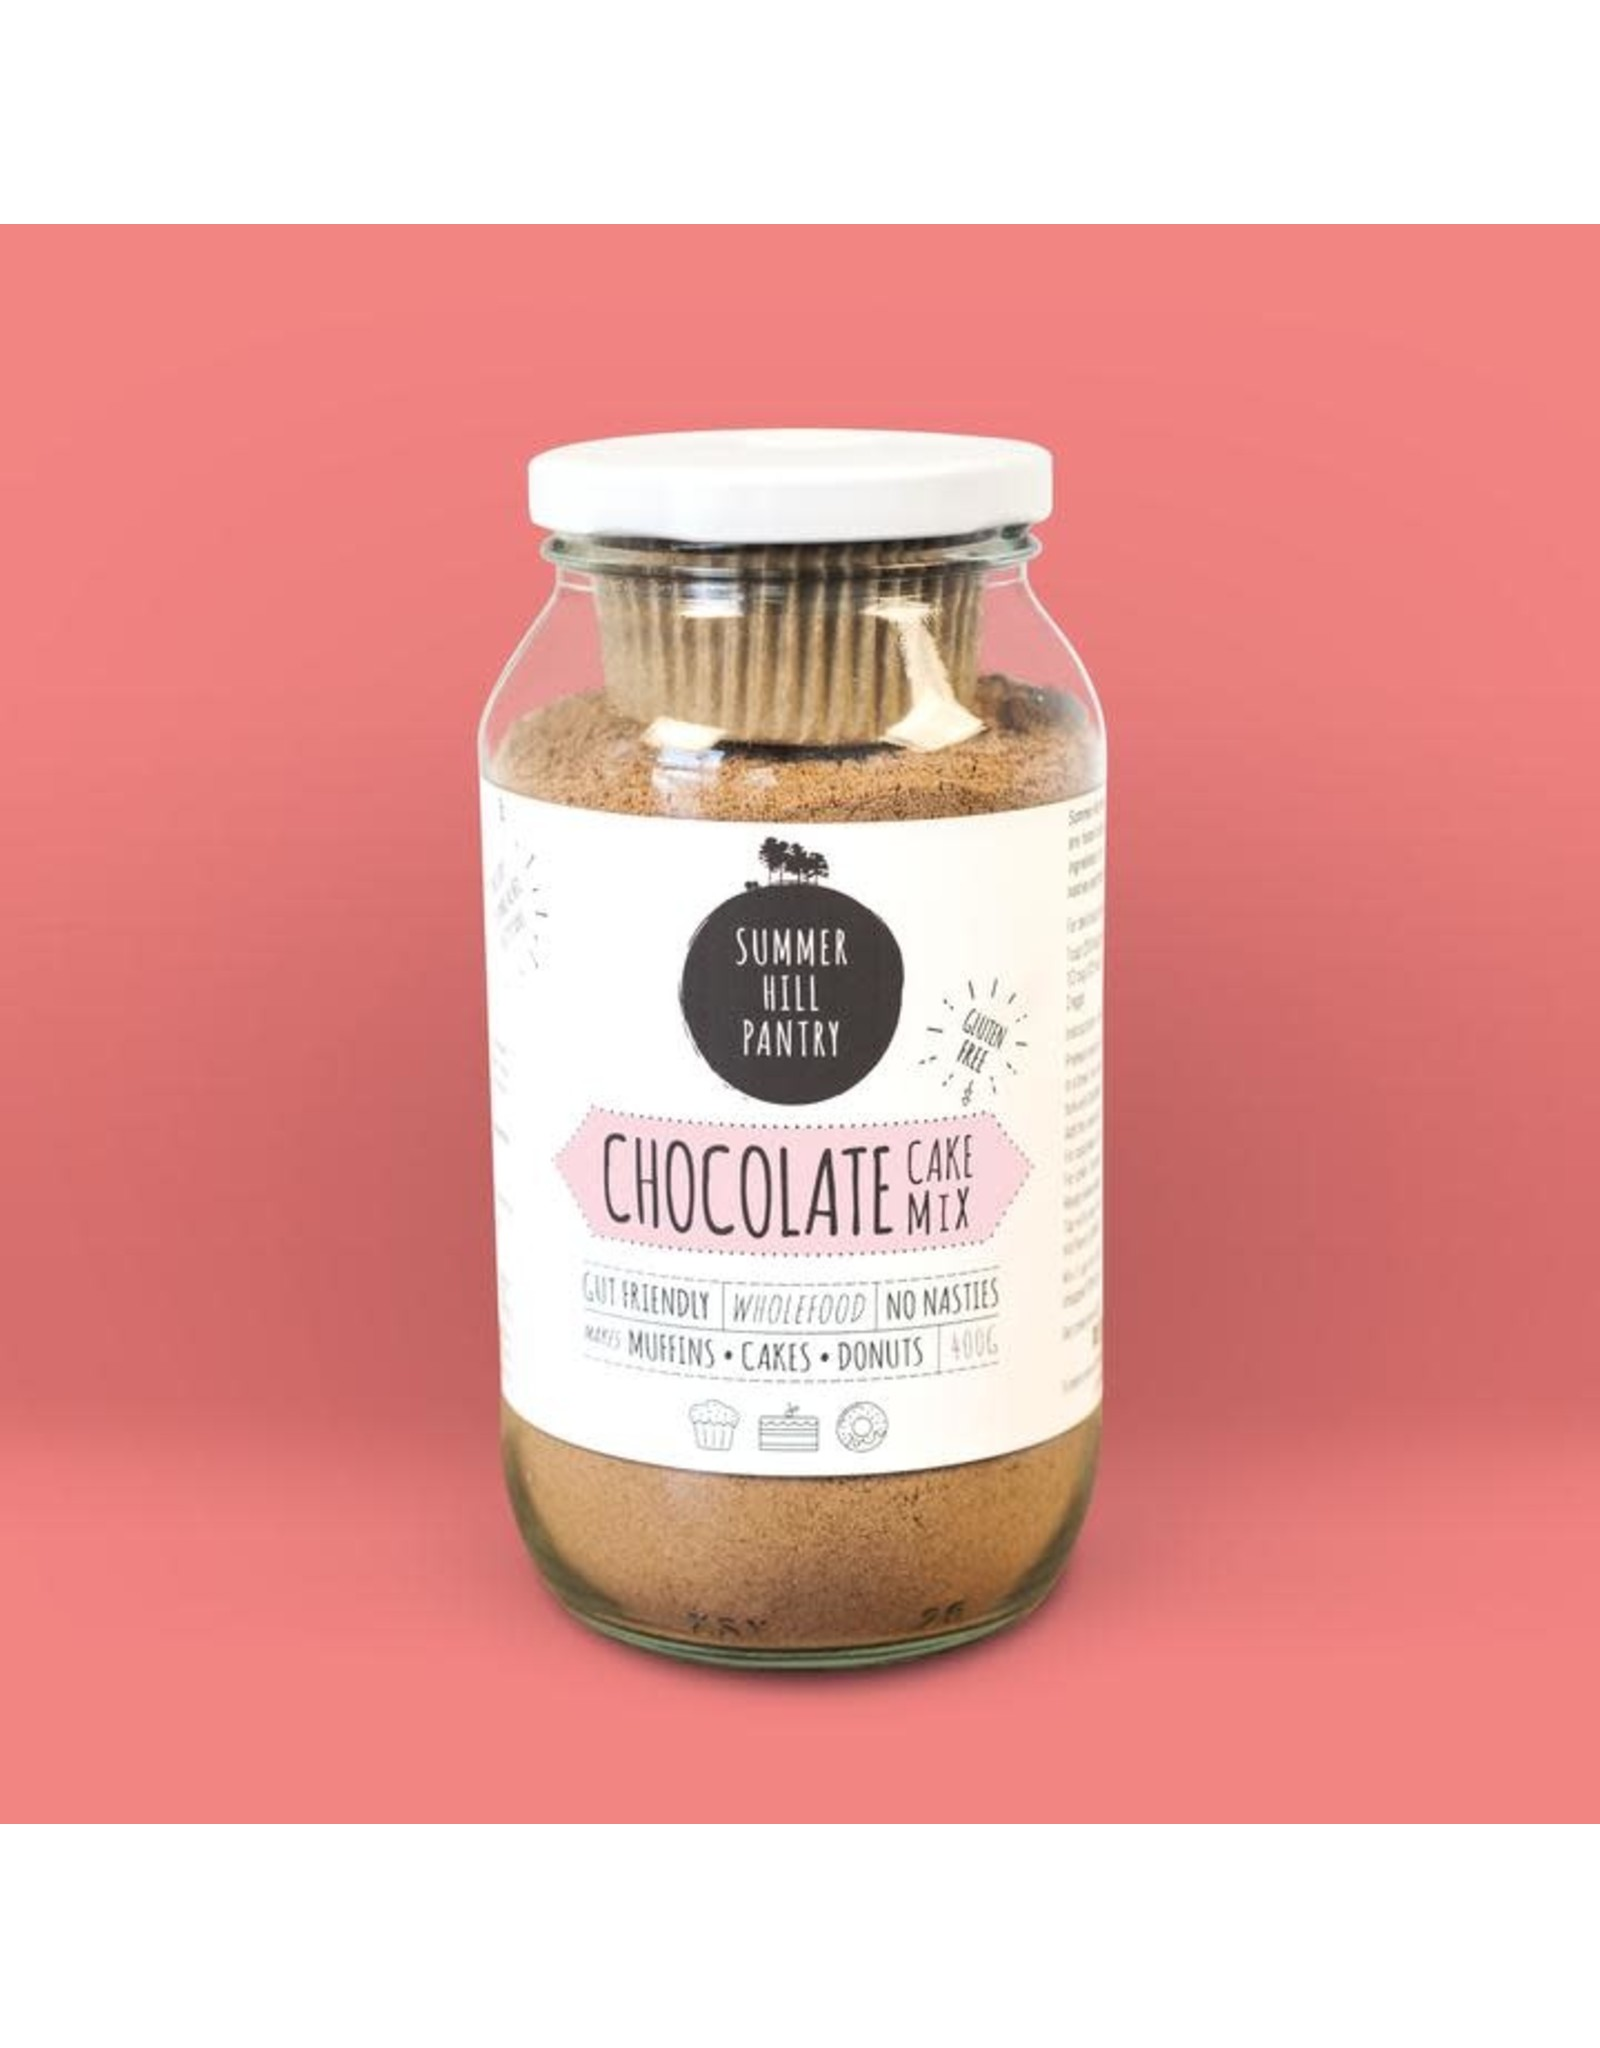 Summerhill Pantry Chocolate Cake Mix 400g Jar